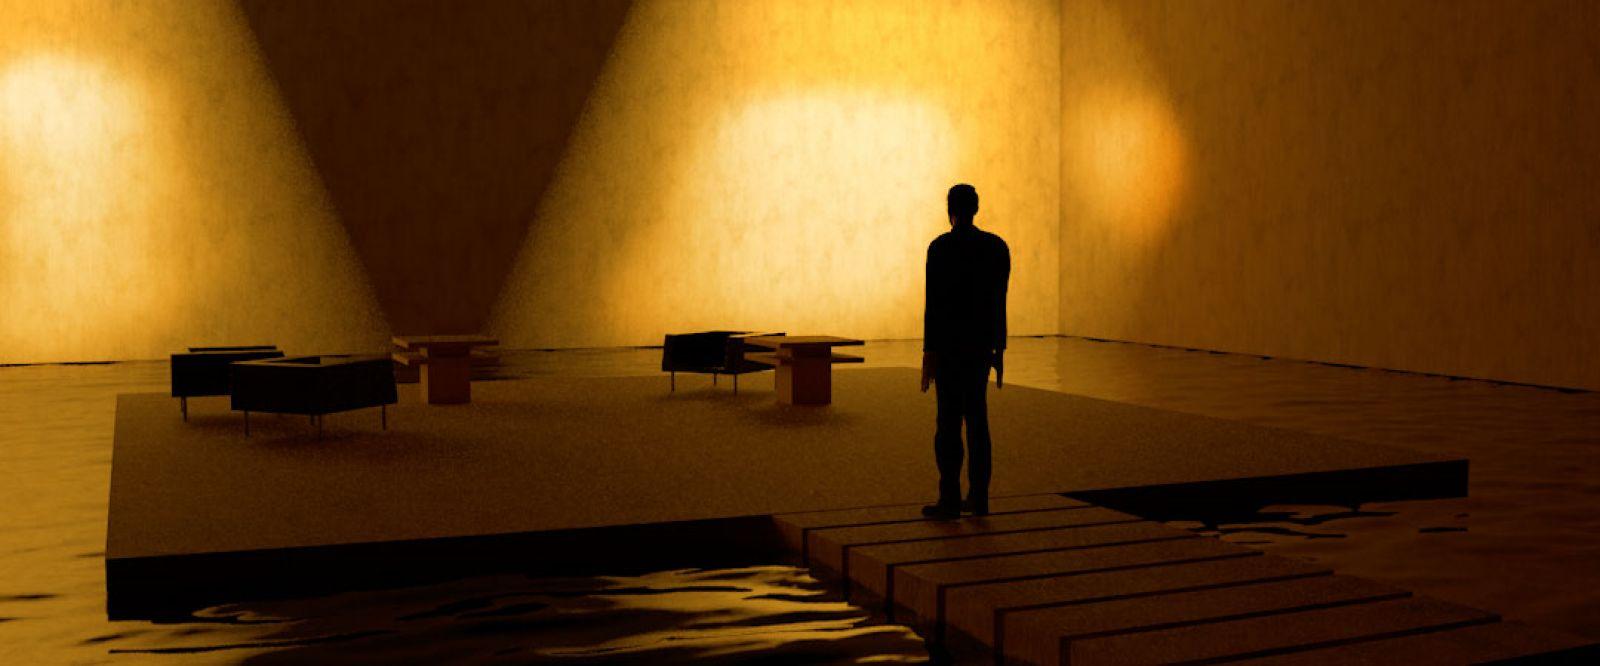 Surprising Blade Runner 2049 Lighting Diagrams Lighting Roger A Deakins Wiring Digital Resources Bemuashebarightsorg